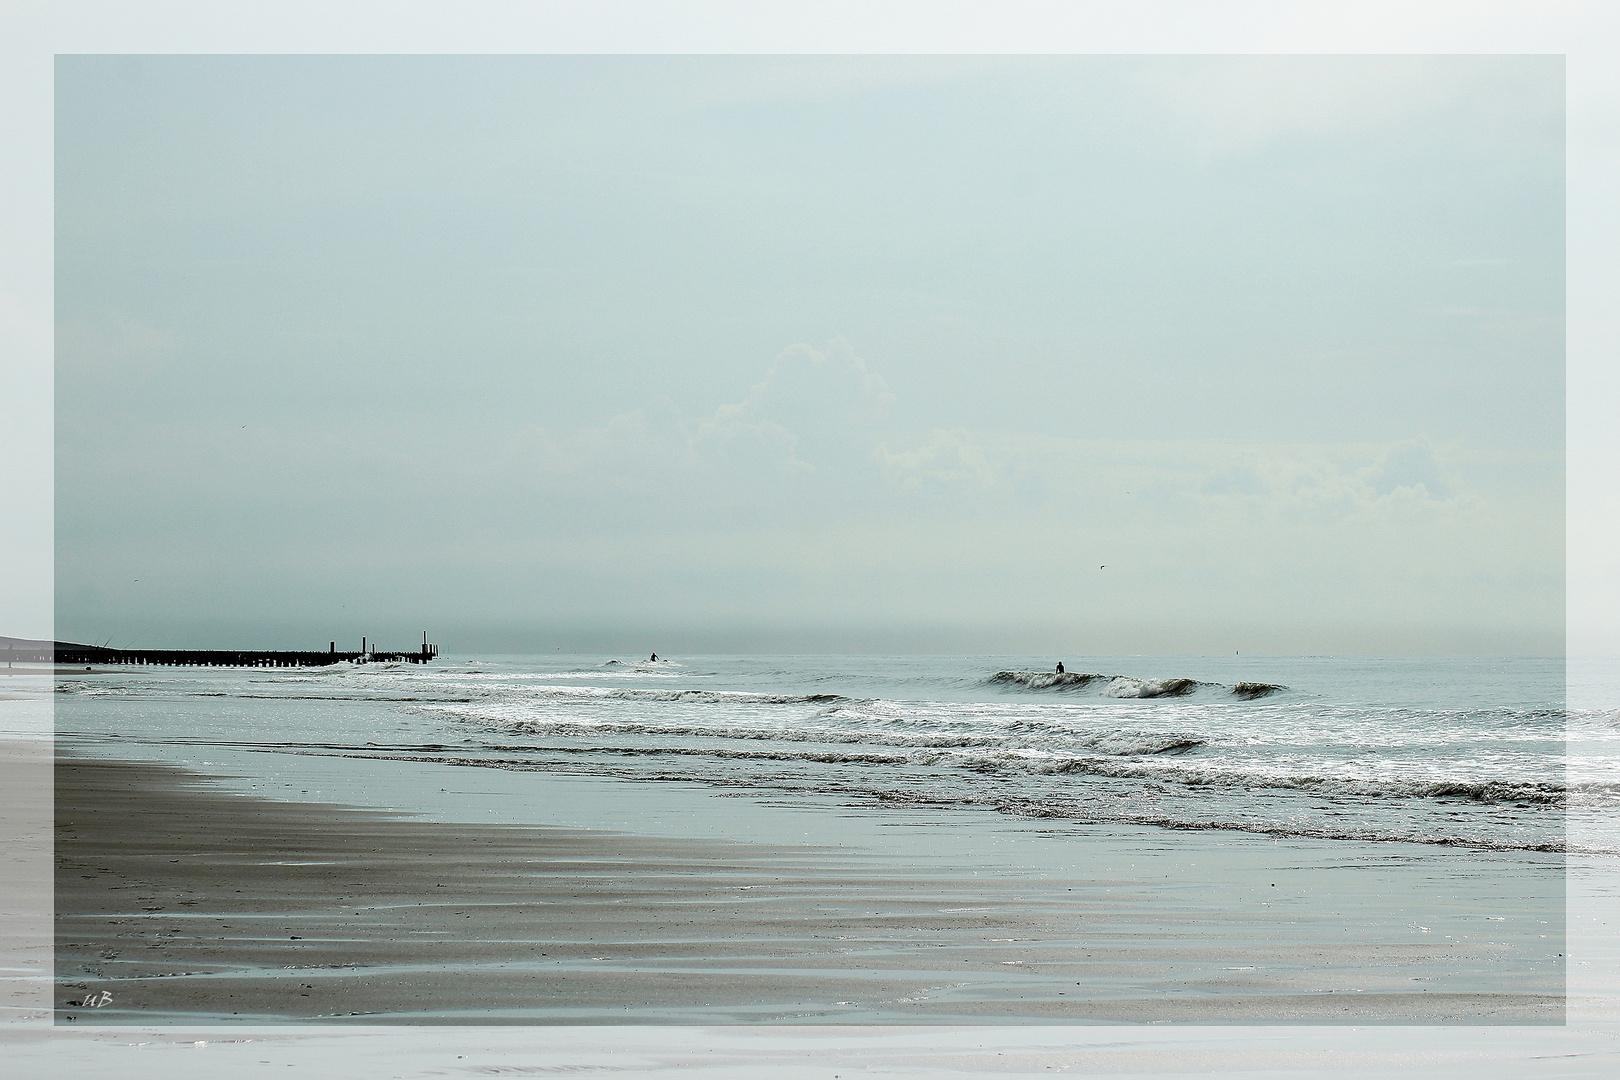 ... am Strand ...